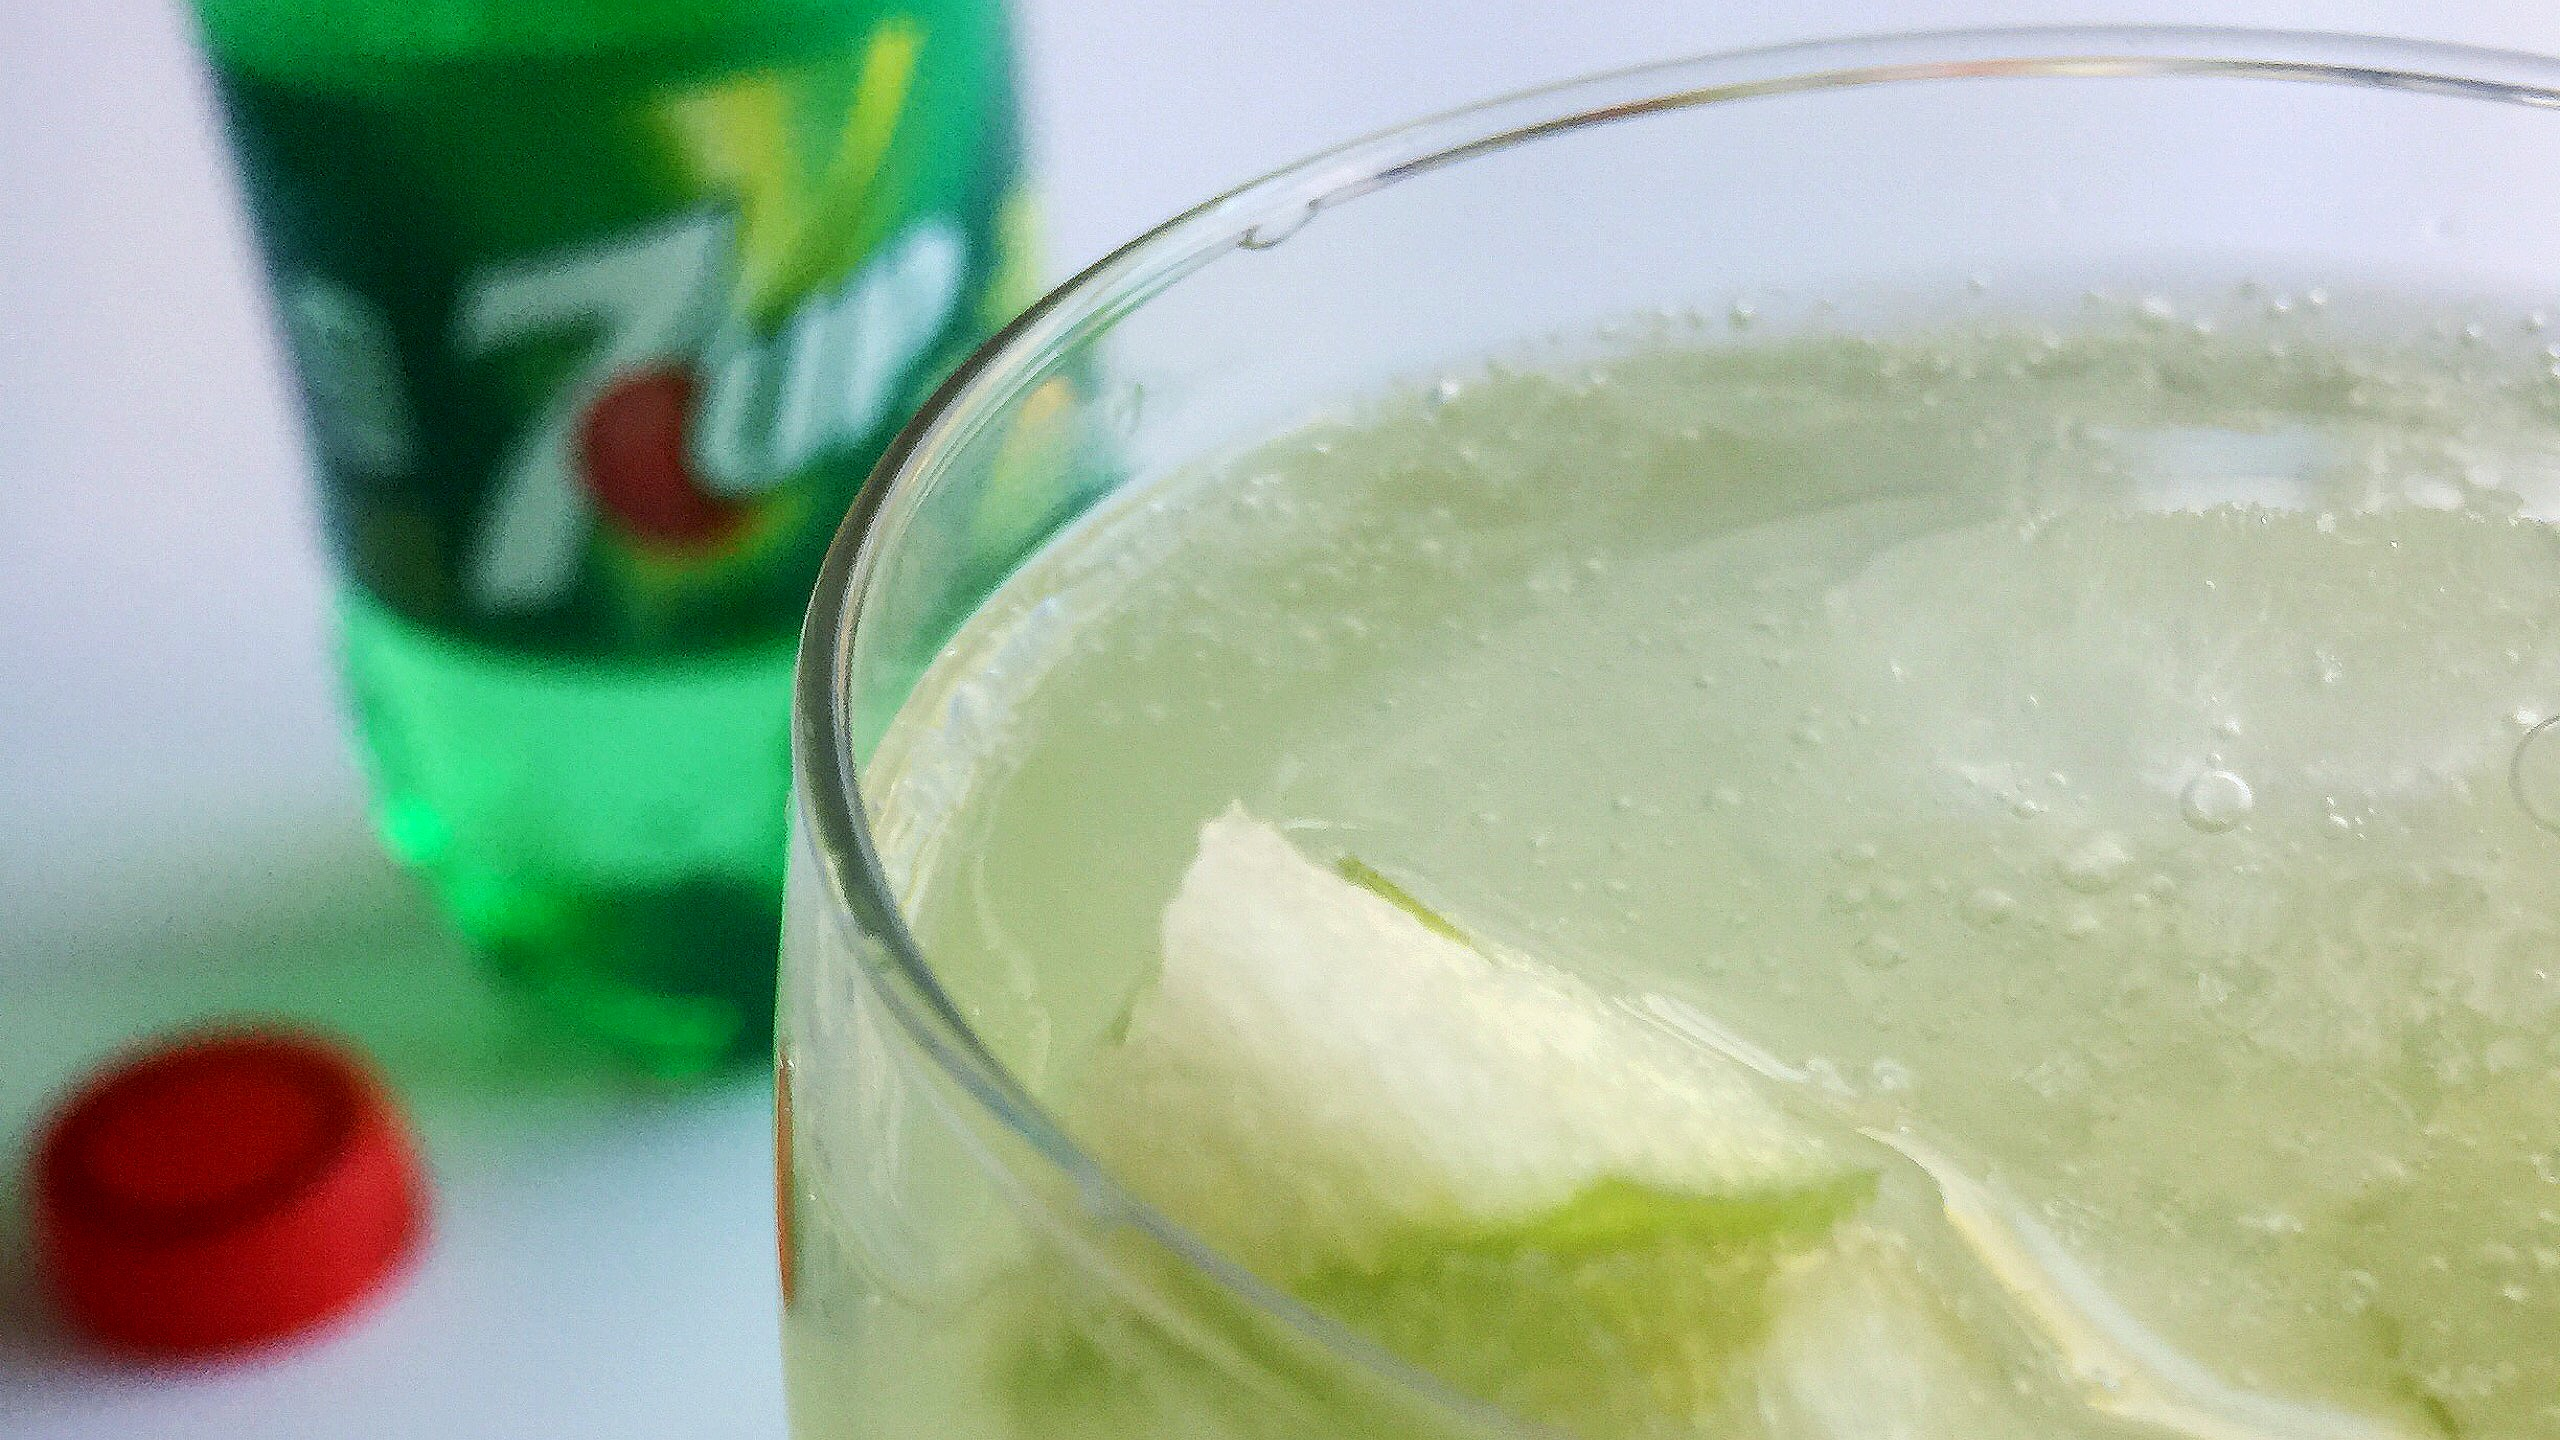 Sour Green Apple Iced Spritzer 7UP Mocktail © www.roastedbeanz.com [AD] #JustAdd7UP #CollectiveBias #shop